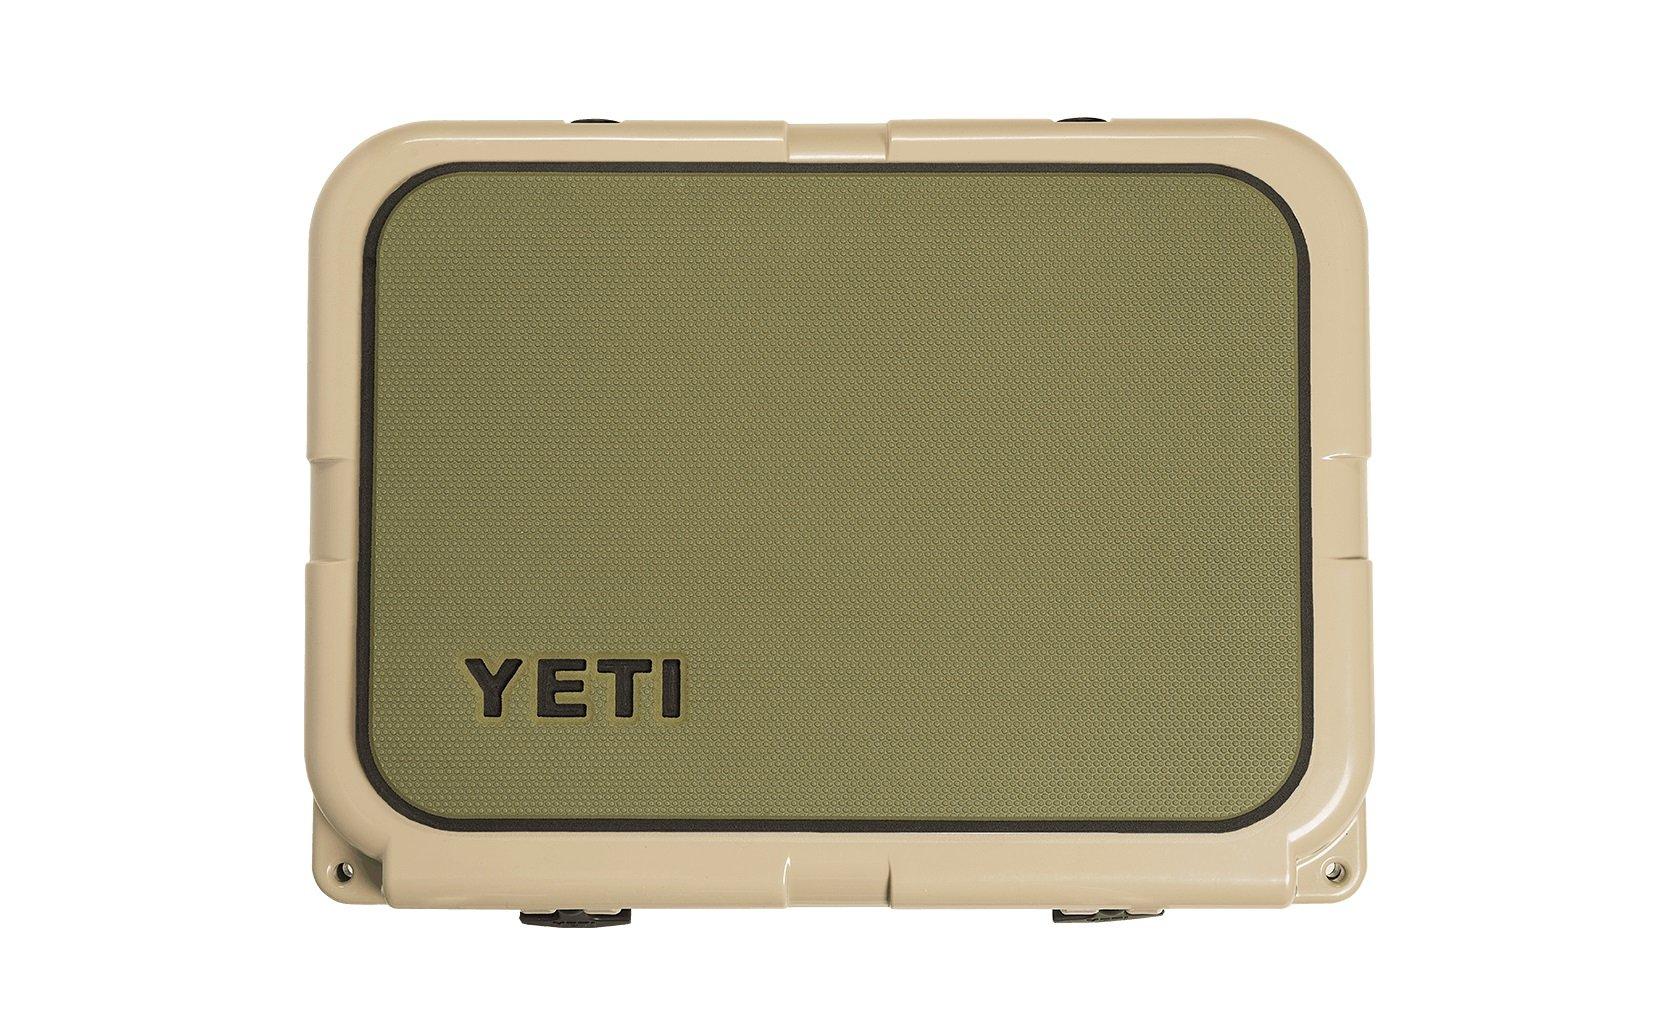 YETI Tundra 35 SeaDek - Olive Green by YETI